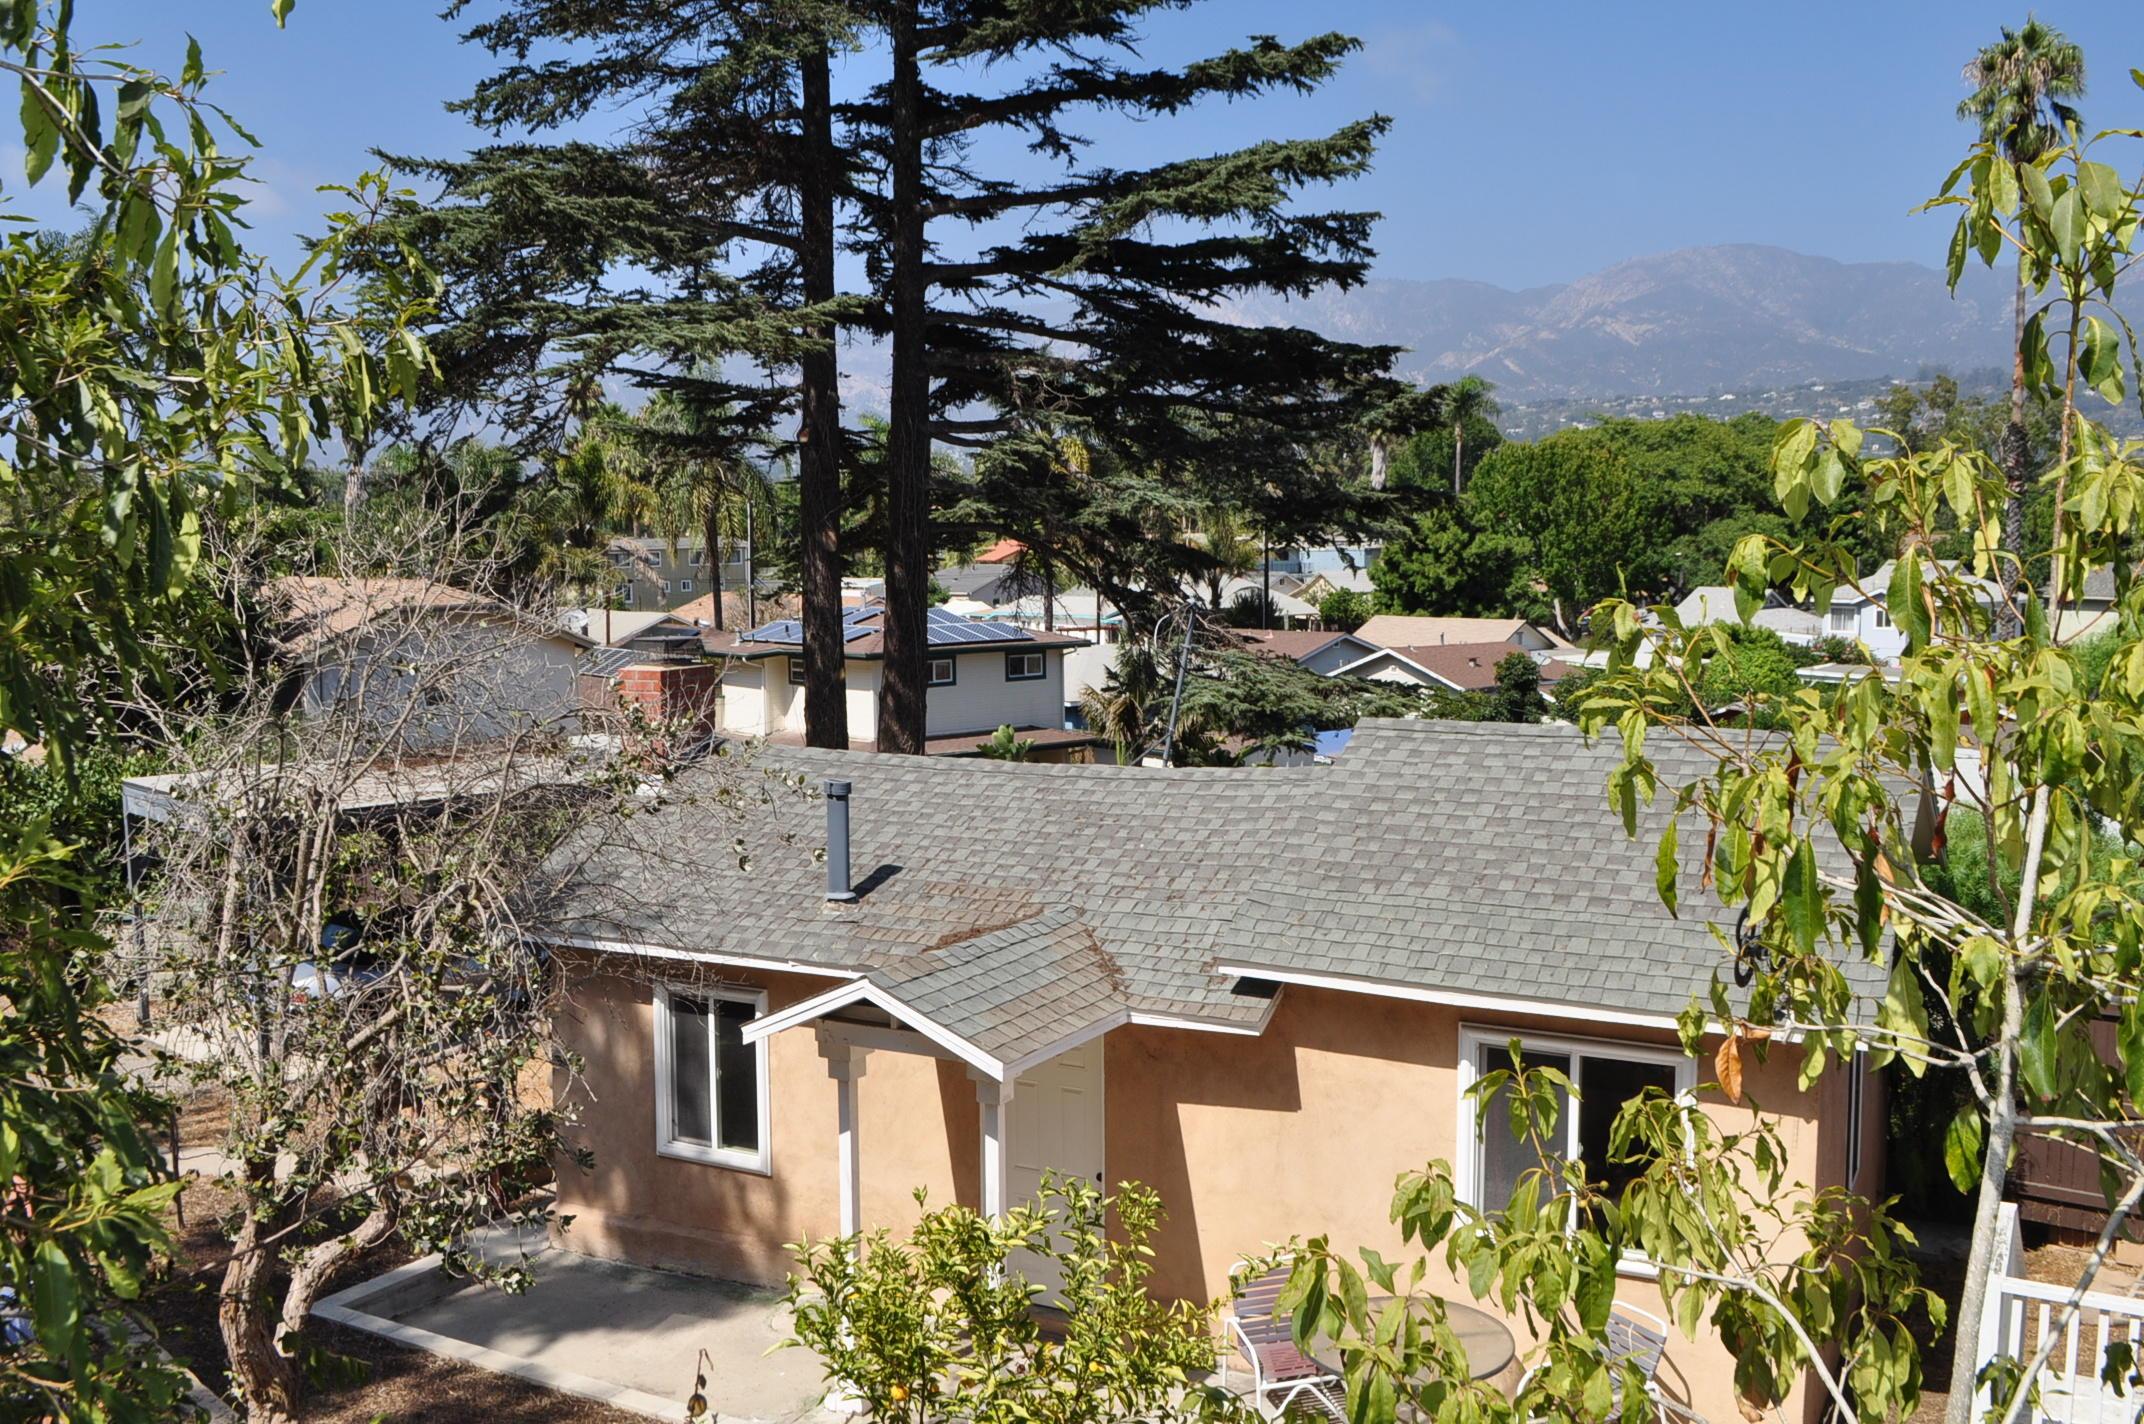 Property photo for 638 Sutton Ave Santa Barbara, California 93101 - 18-3397